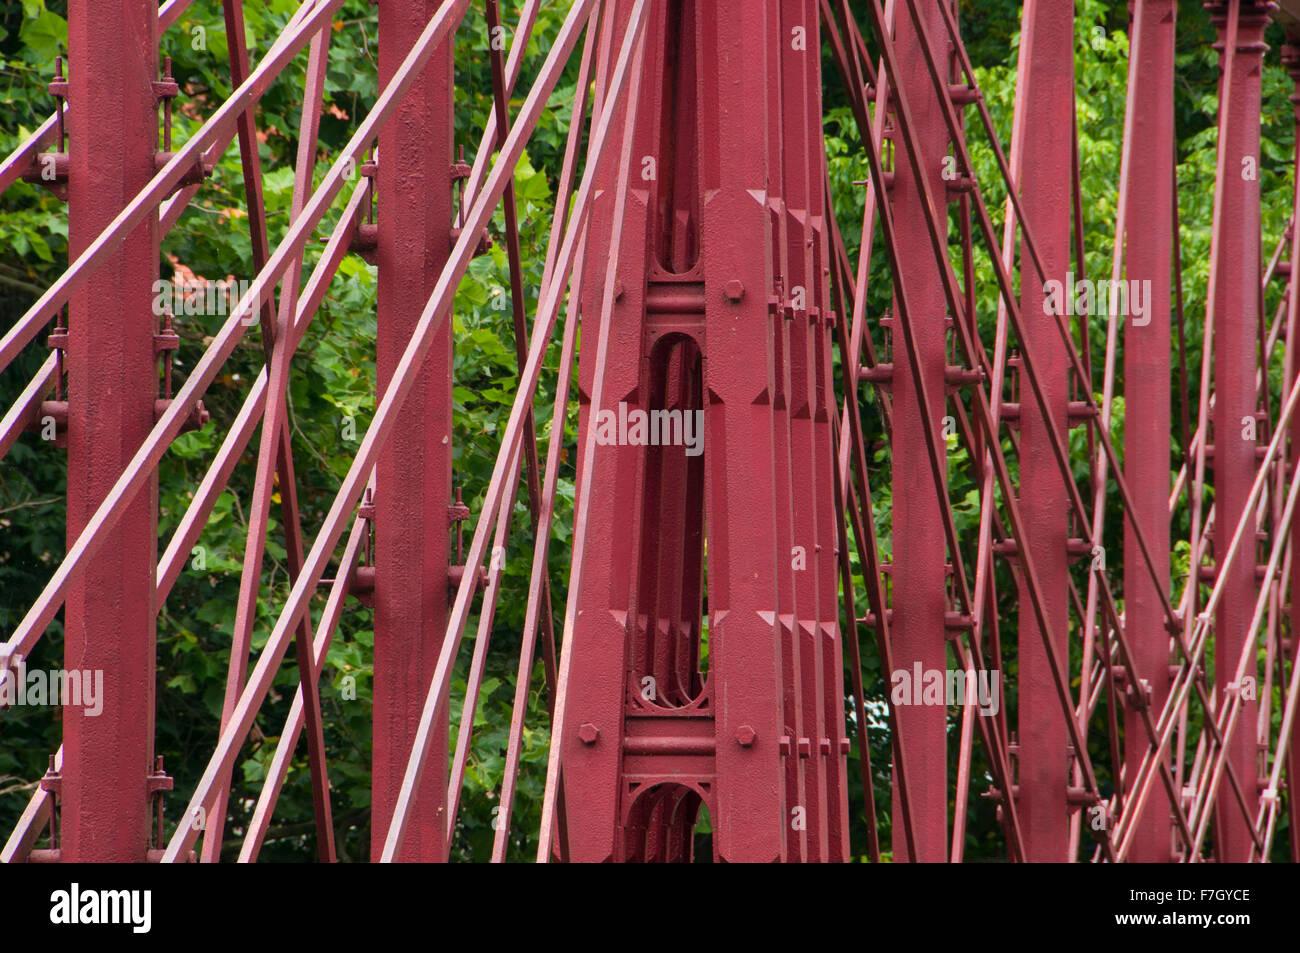 Double Truss Stock Photos Images Alamy Burr Arch Diagram Penn Central Bridge Savage Maryland Bollman Iron 1869 Park Image